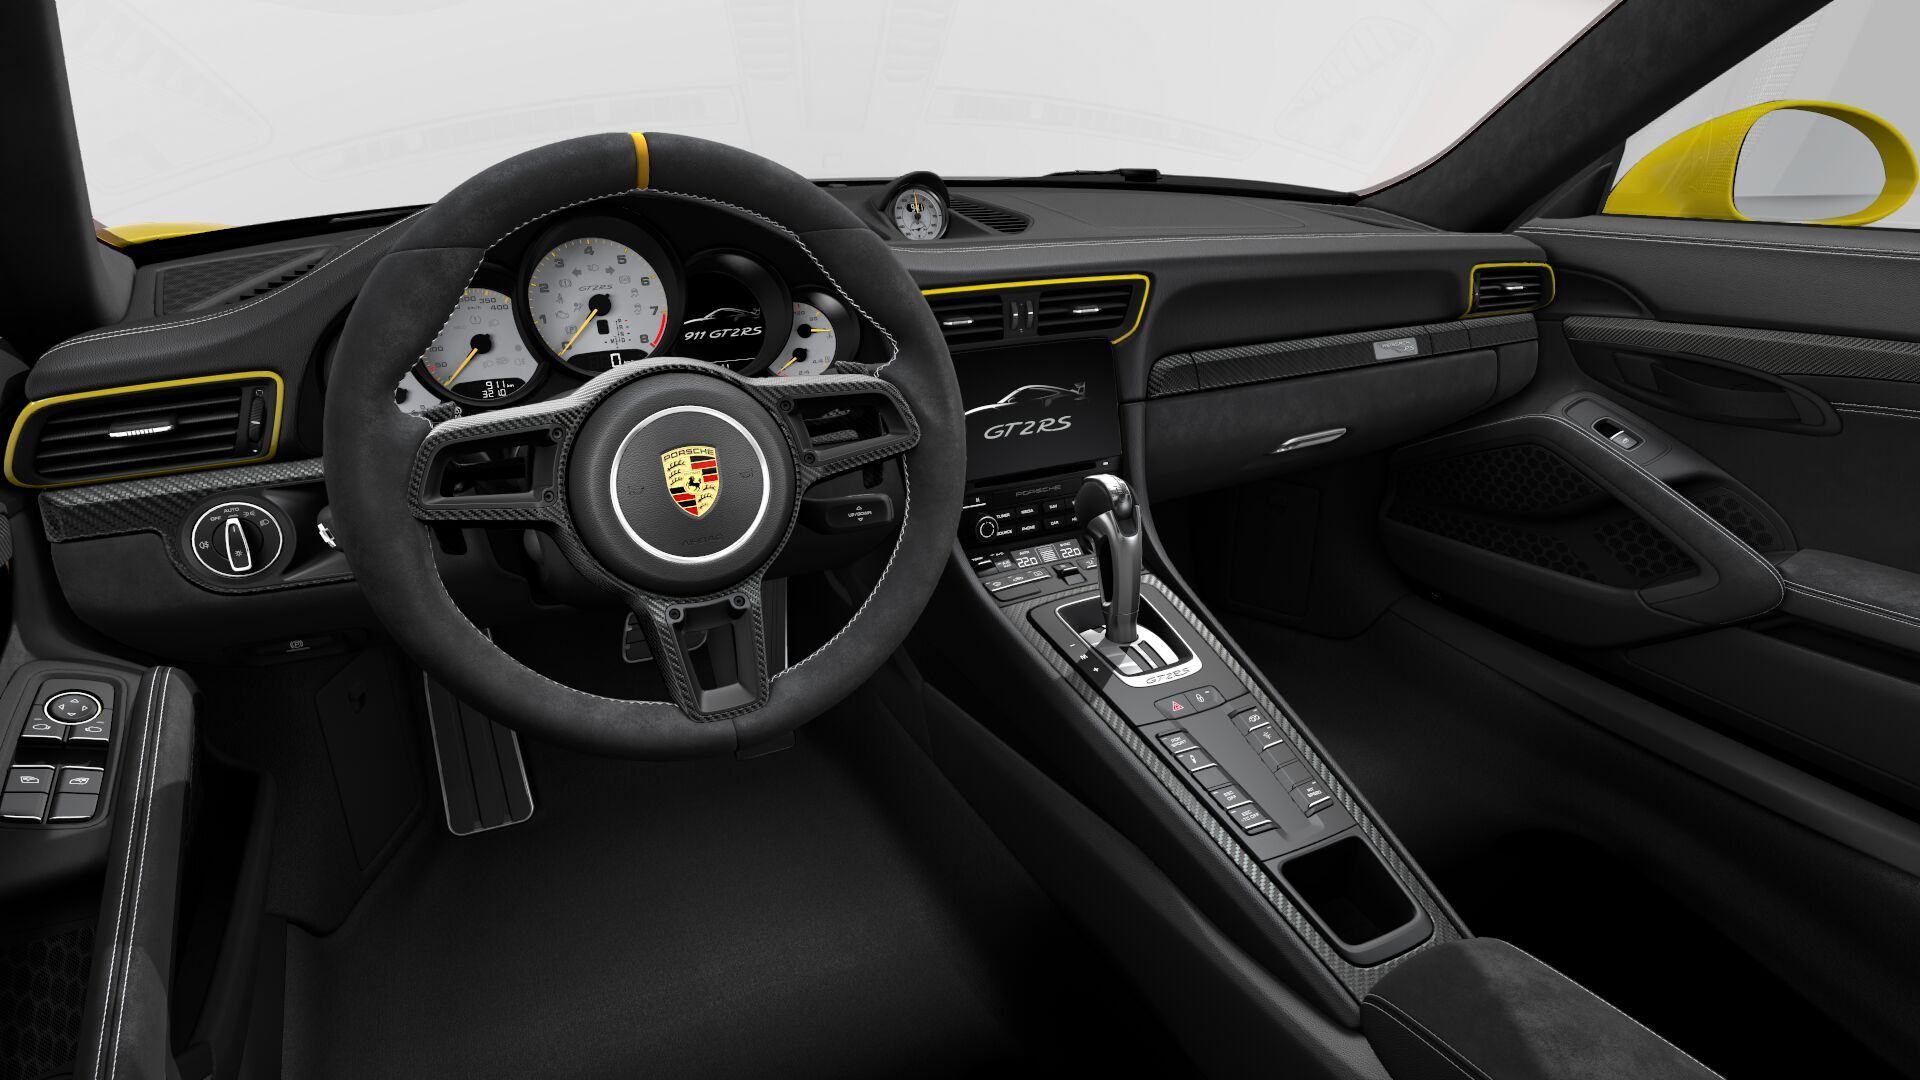 Racing-Yellow-Porsche-911-GT2-RS-5 Wonderful Porsche 911 Gt2 Wheel for Sale Cars Trend